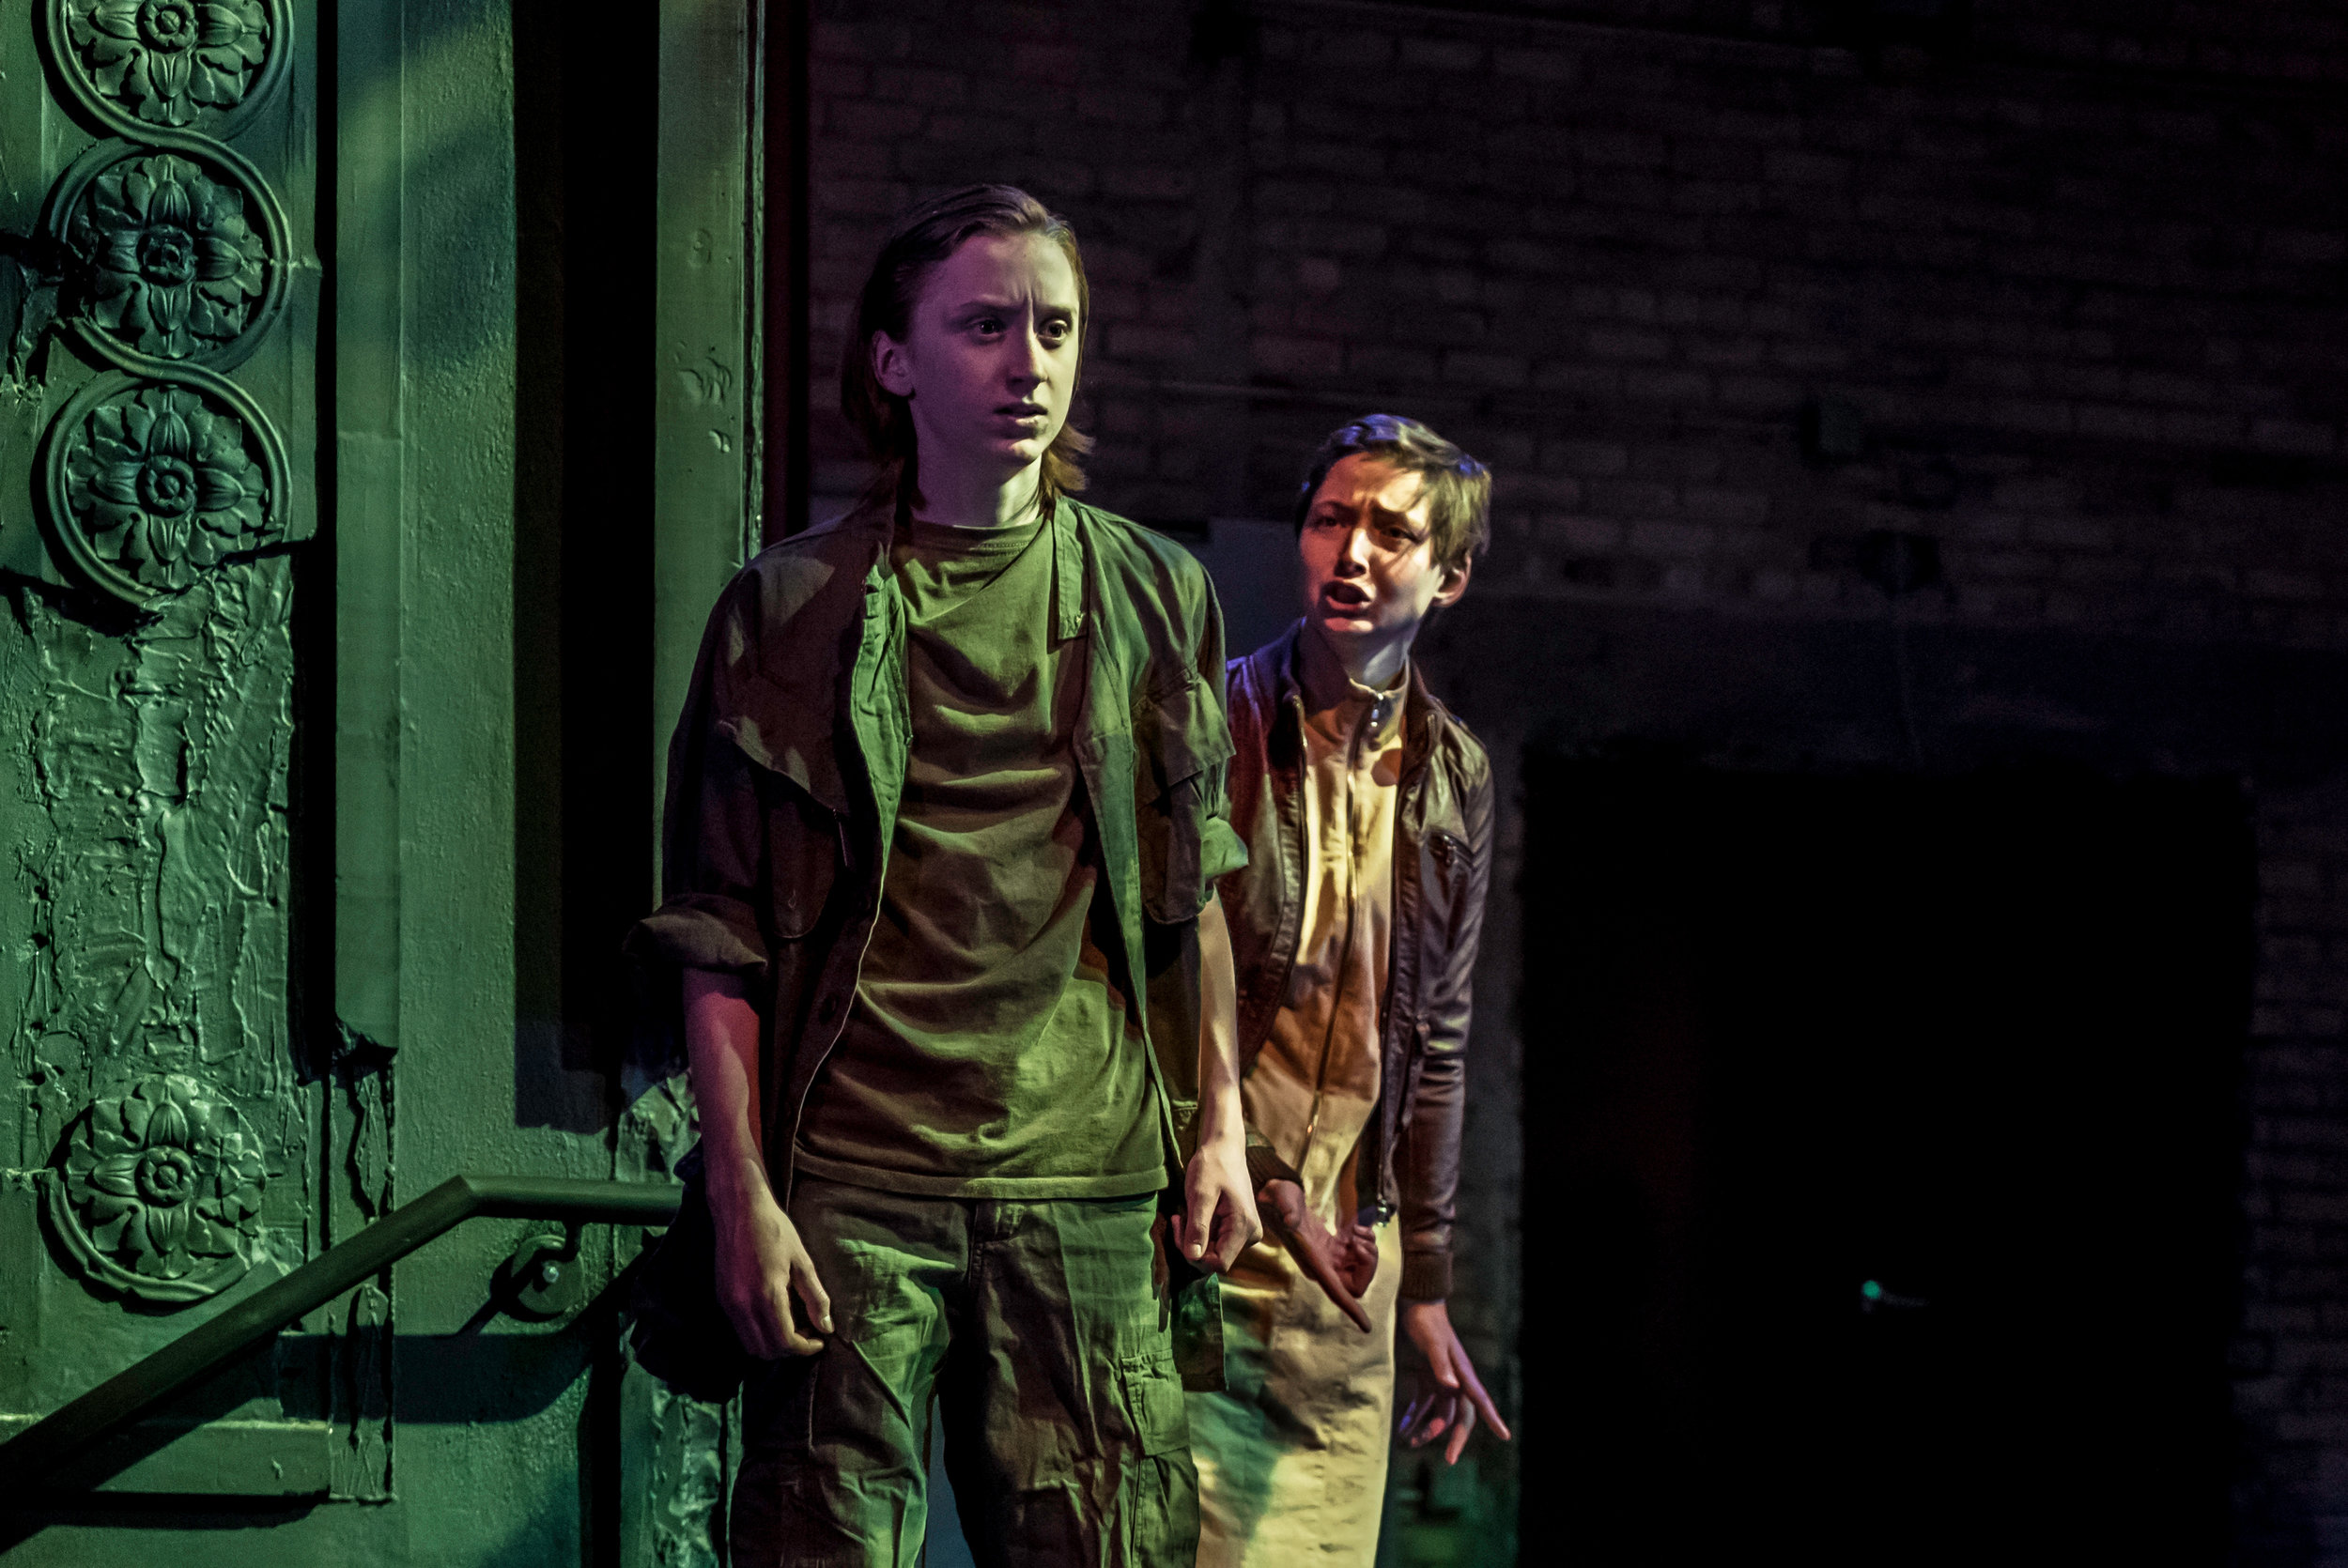 Isaac Jaro as Macbeth and Vee Signorelli as Lady Macbeth in the SYT Core Ensemble production of MACBETH (2016)  Photo: Logan Verdoorn